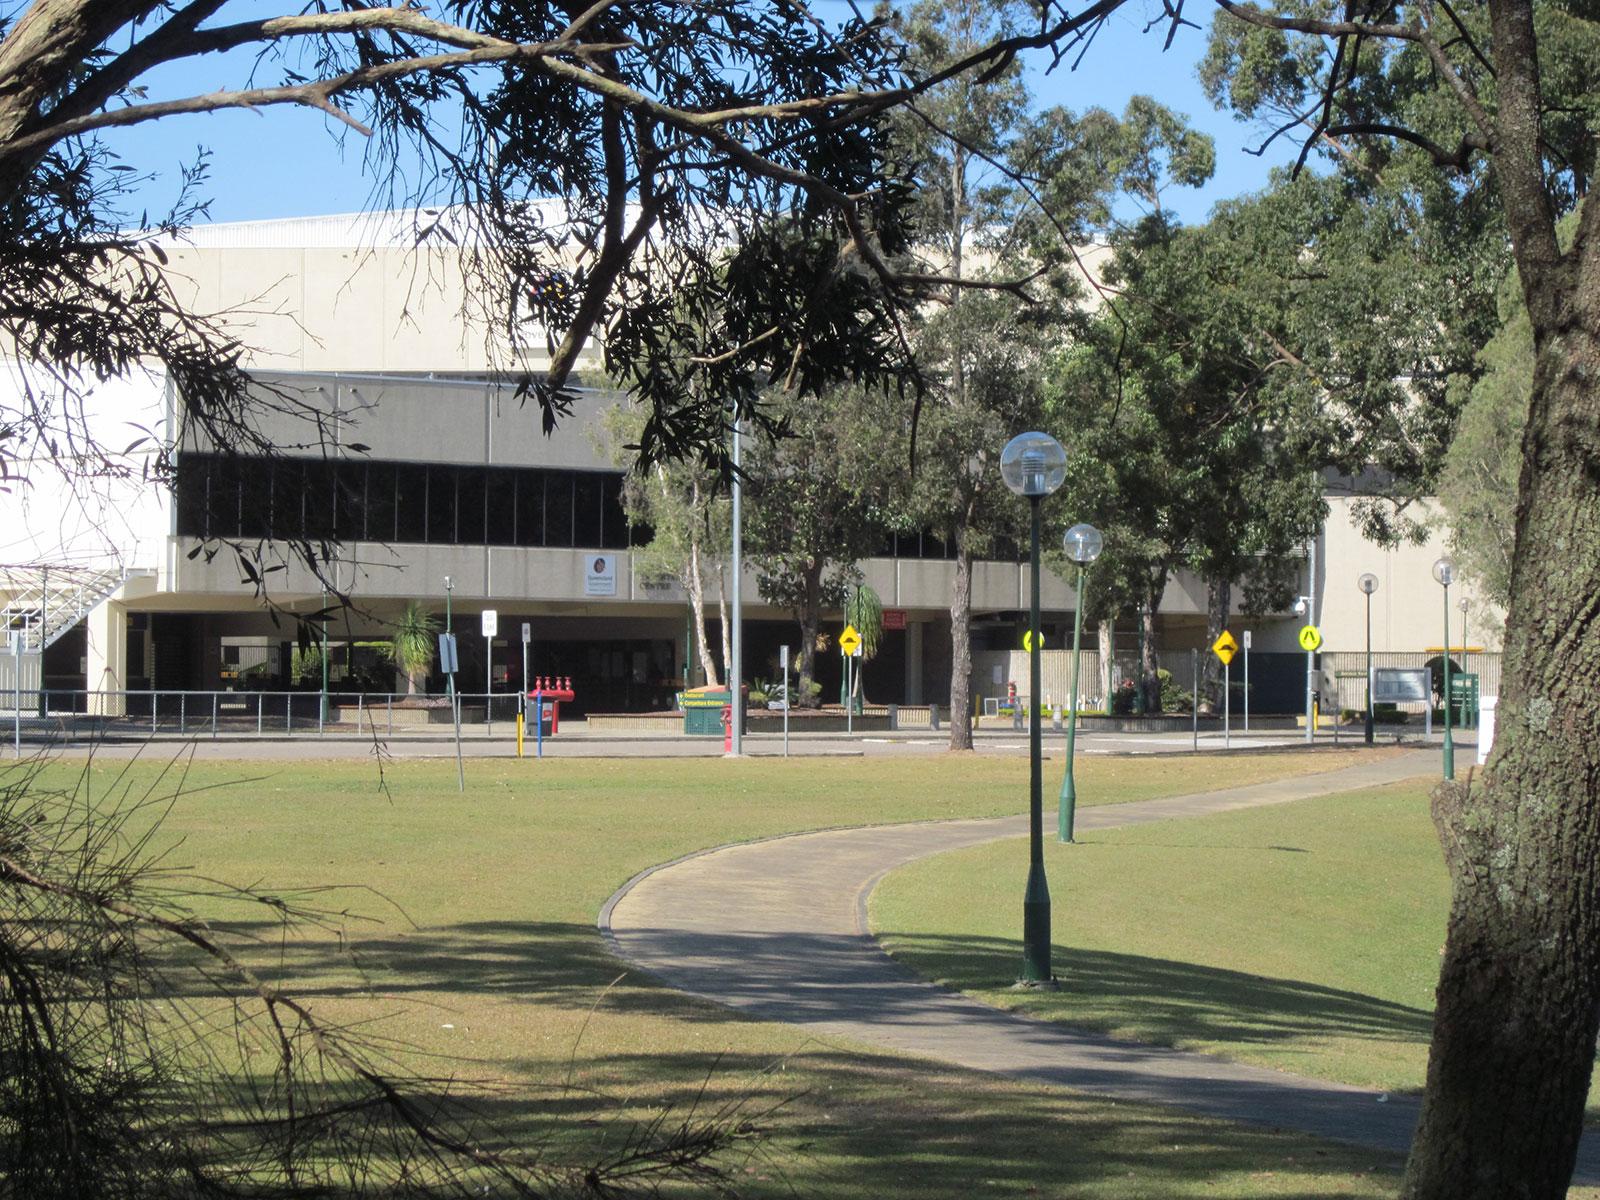 Brisbane Entertainment Centre nestled in natural surrounds